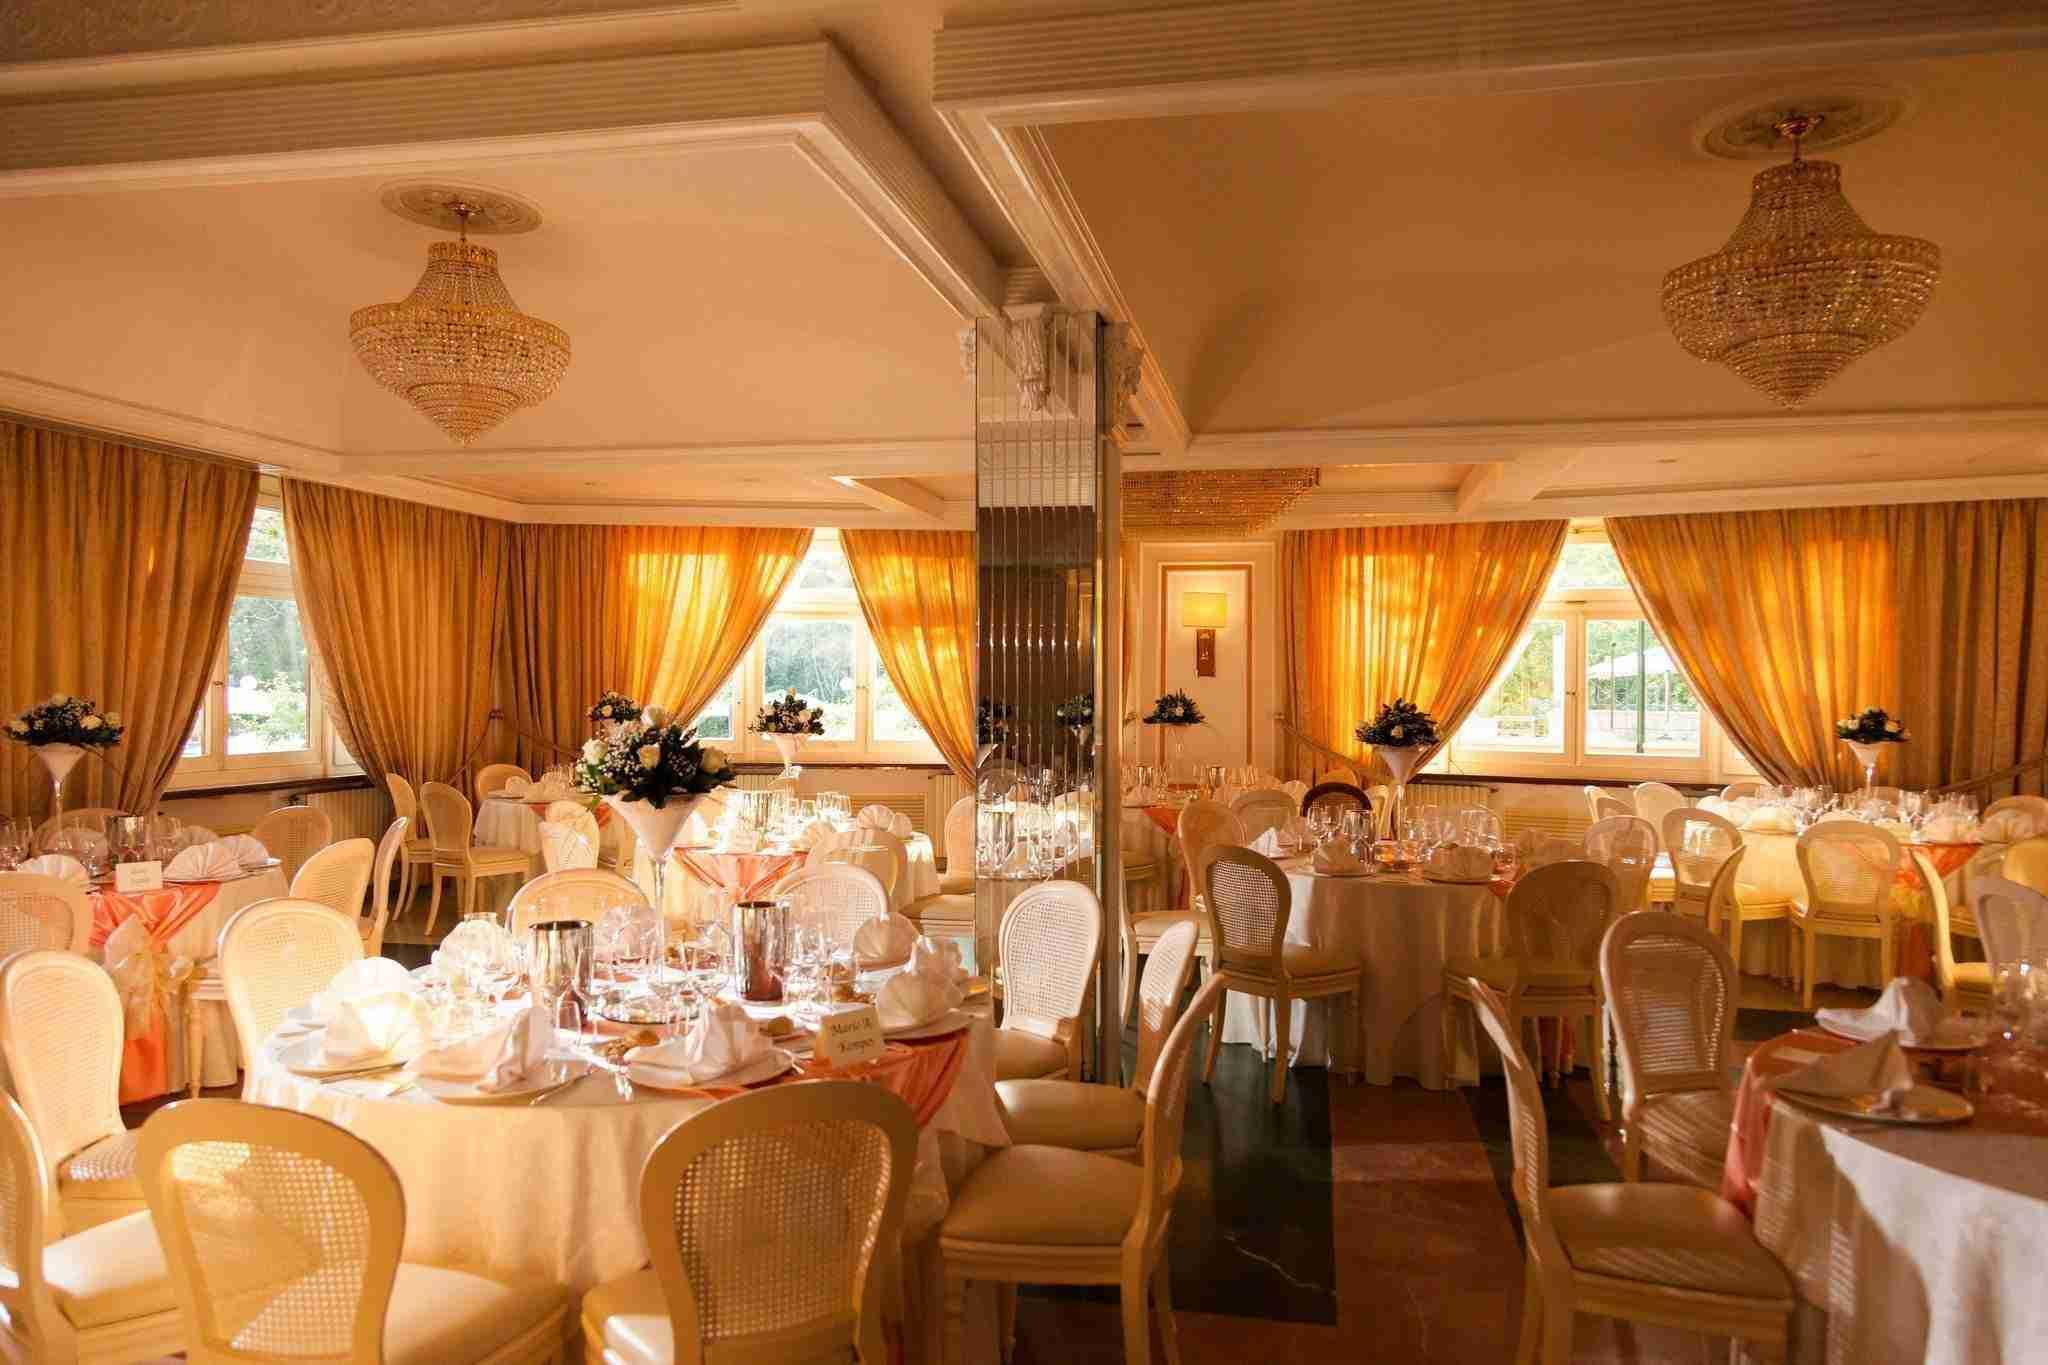 Matrimonio al ristorante la Foresta: Sala interna ricevimento